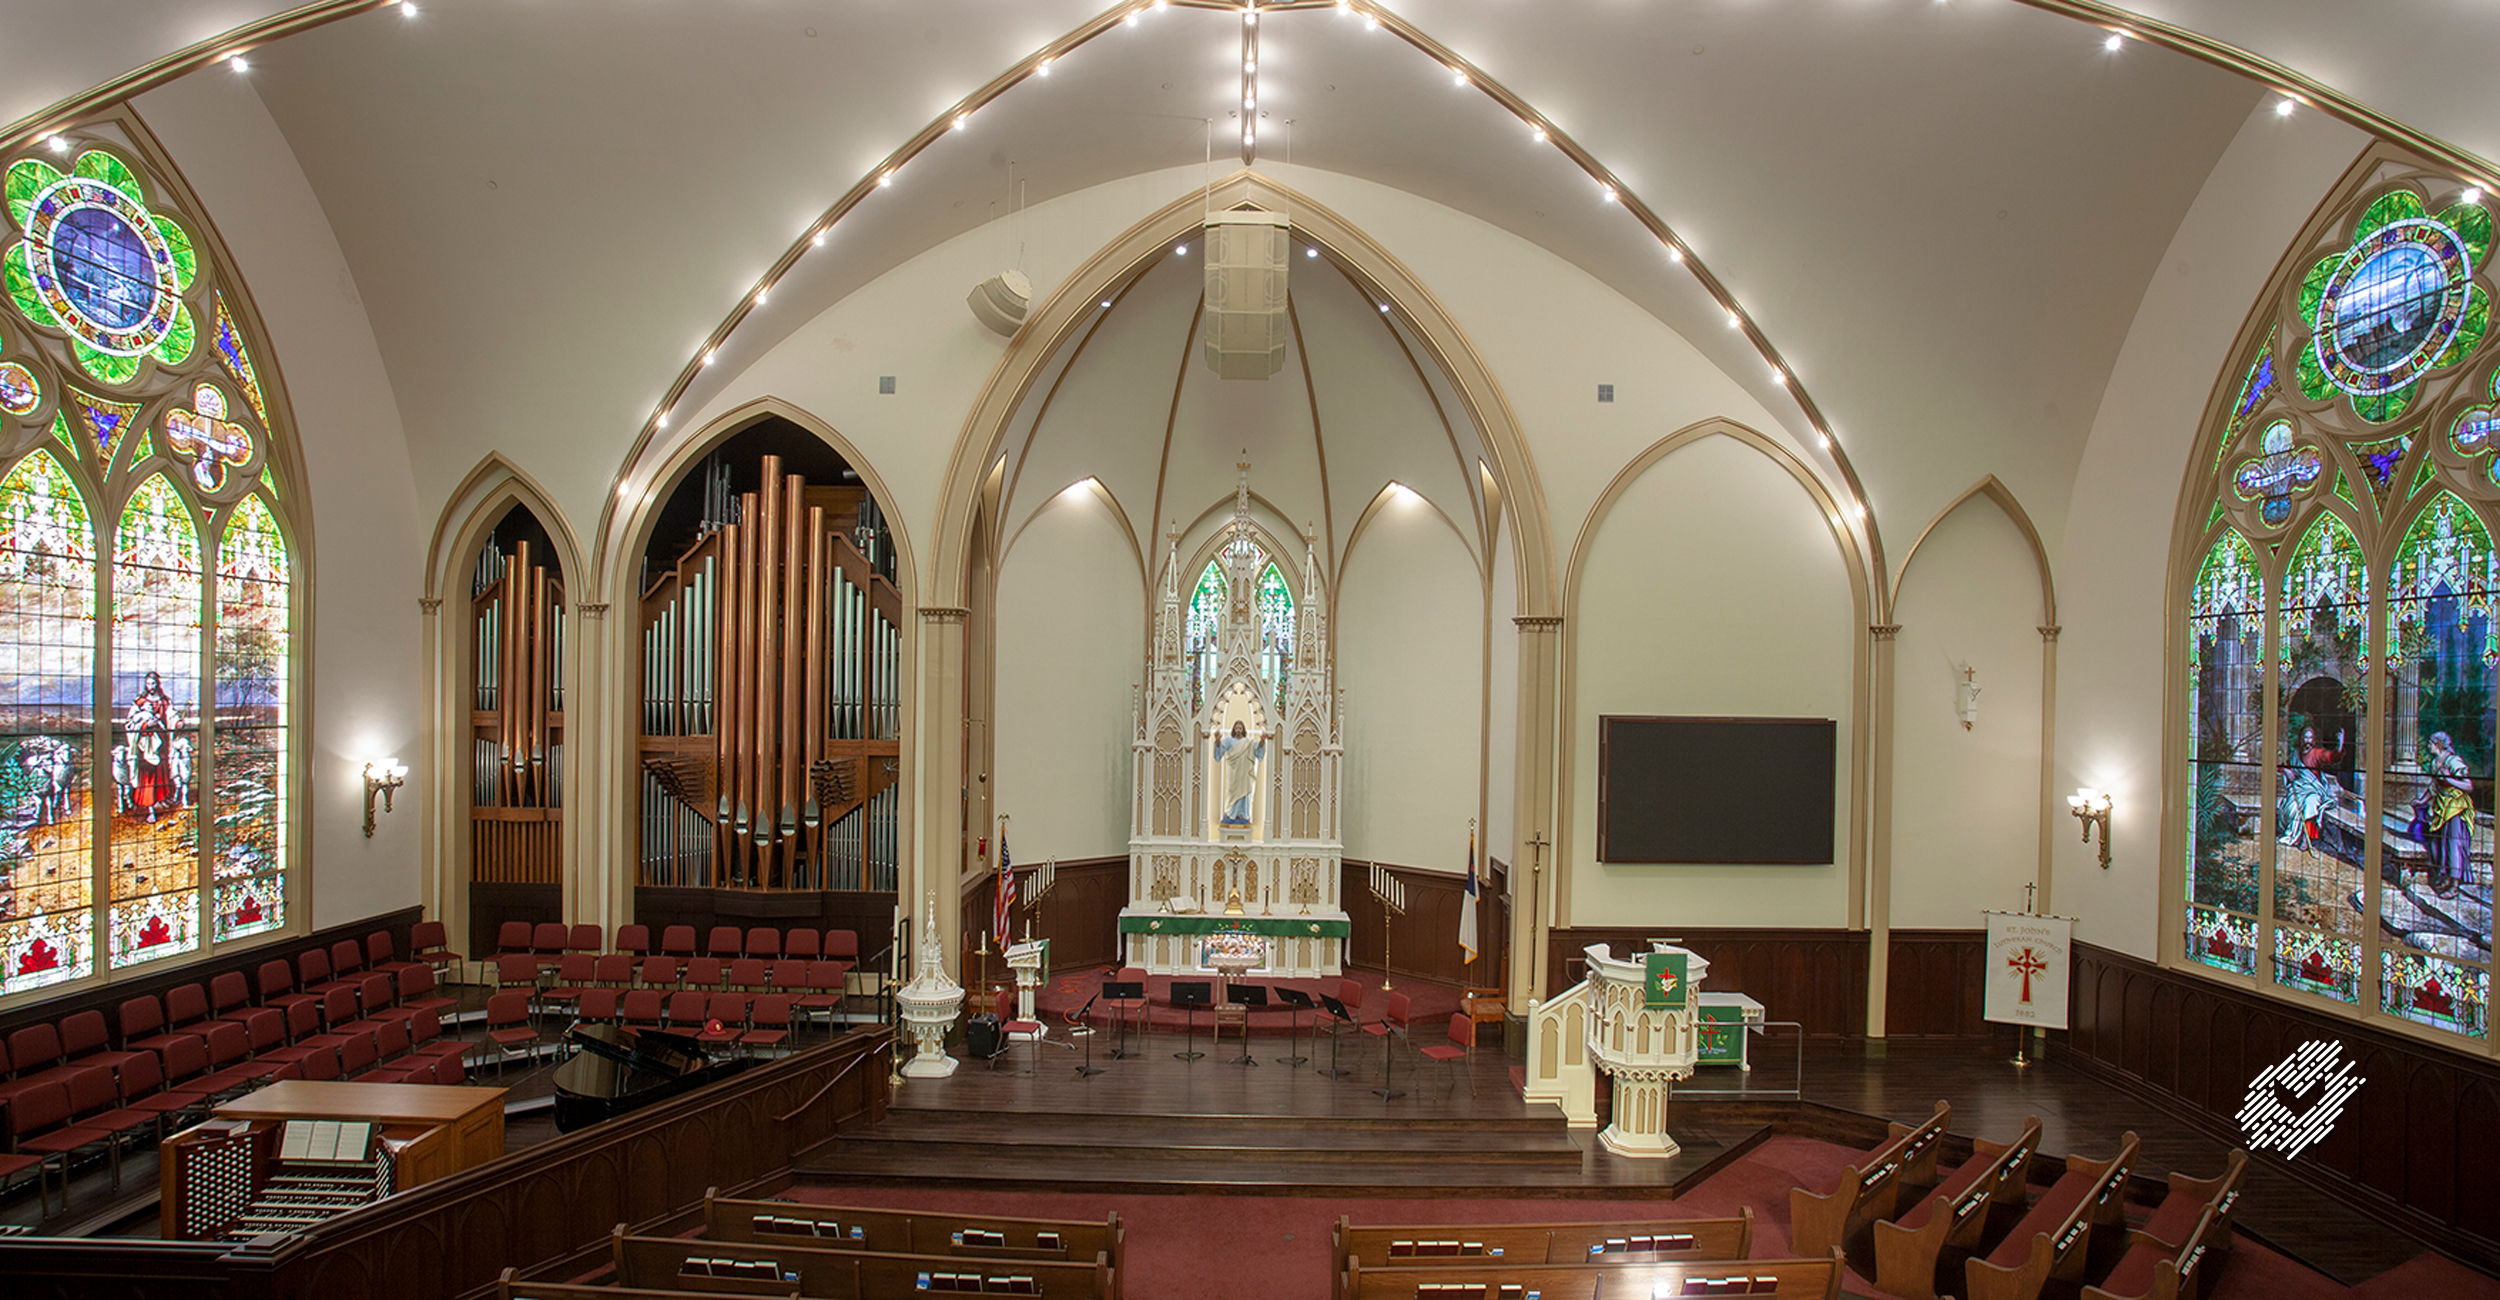 ST JOHN'S LUTHERAN CHURCH of ORANGE